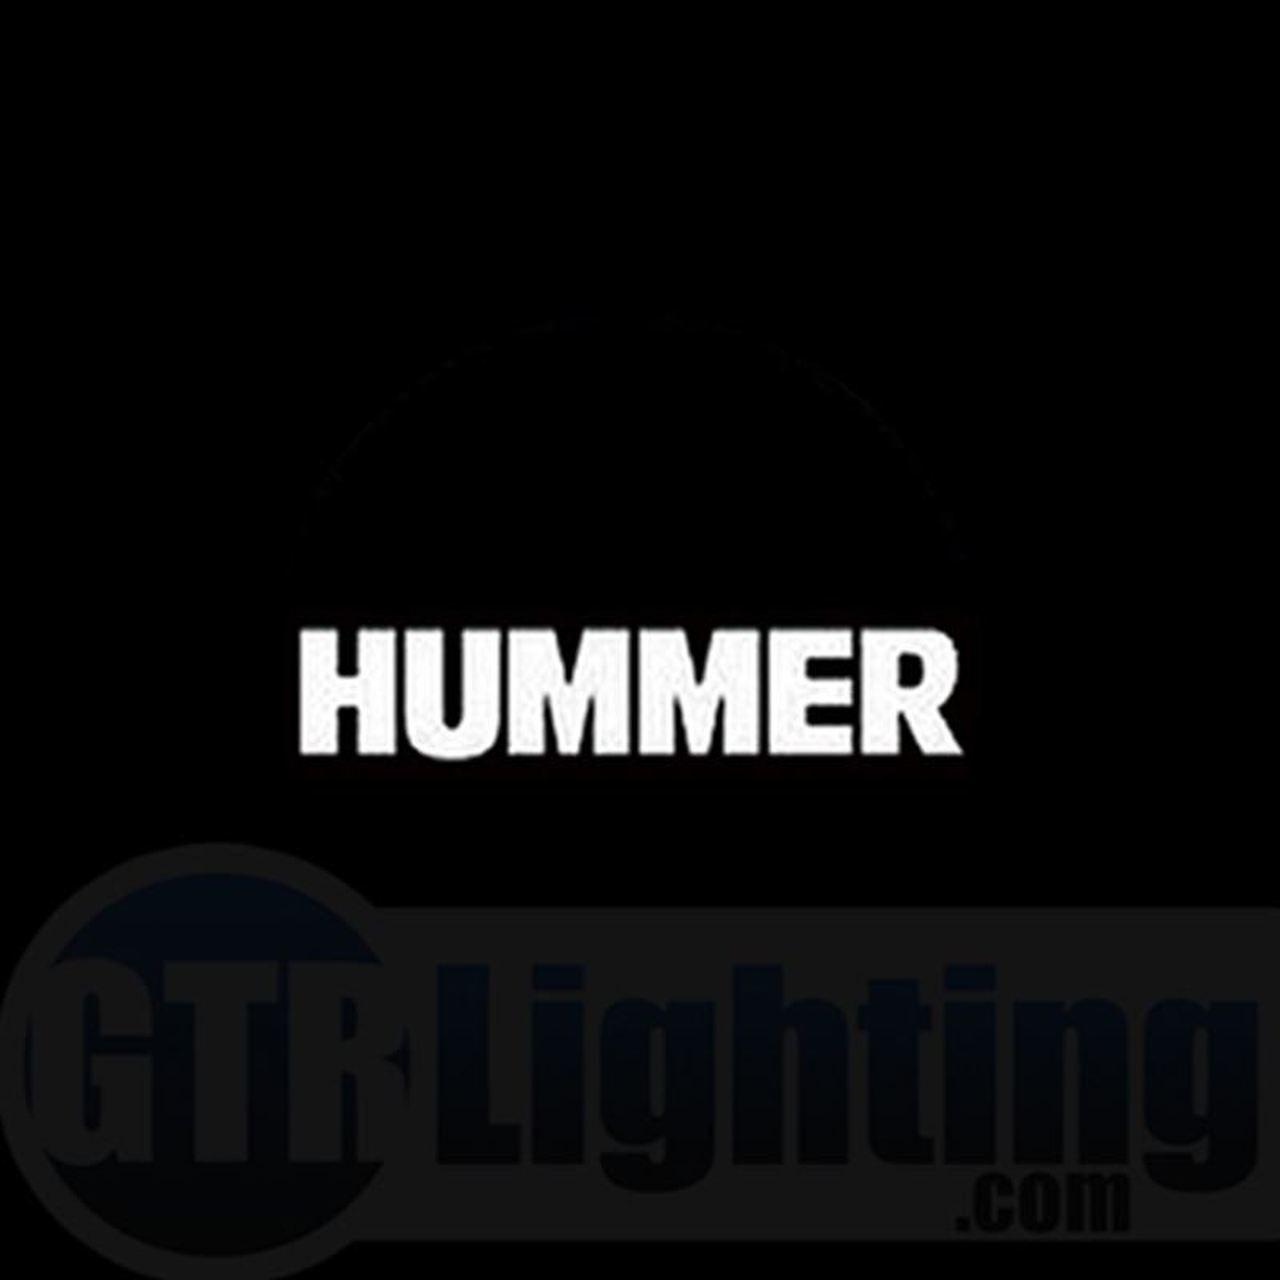 GTR Lighting LED Logo Projectors, Hummer Logo, #37.